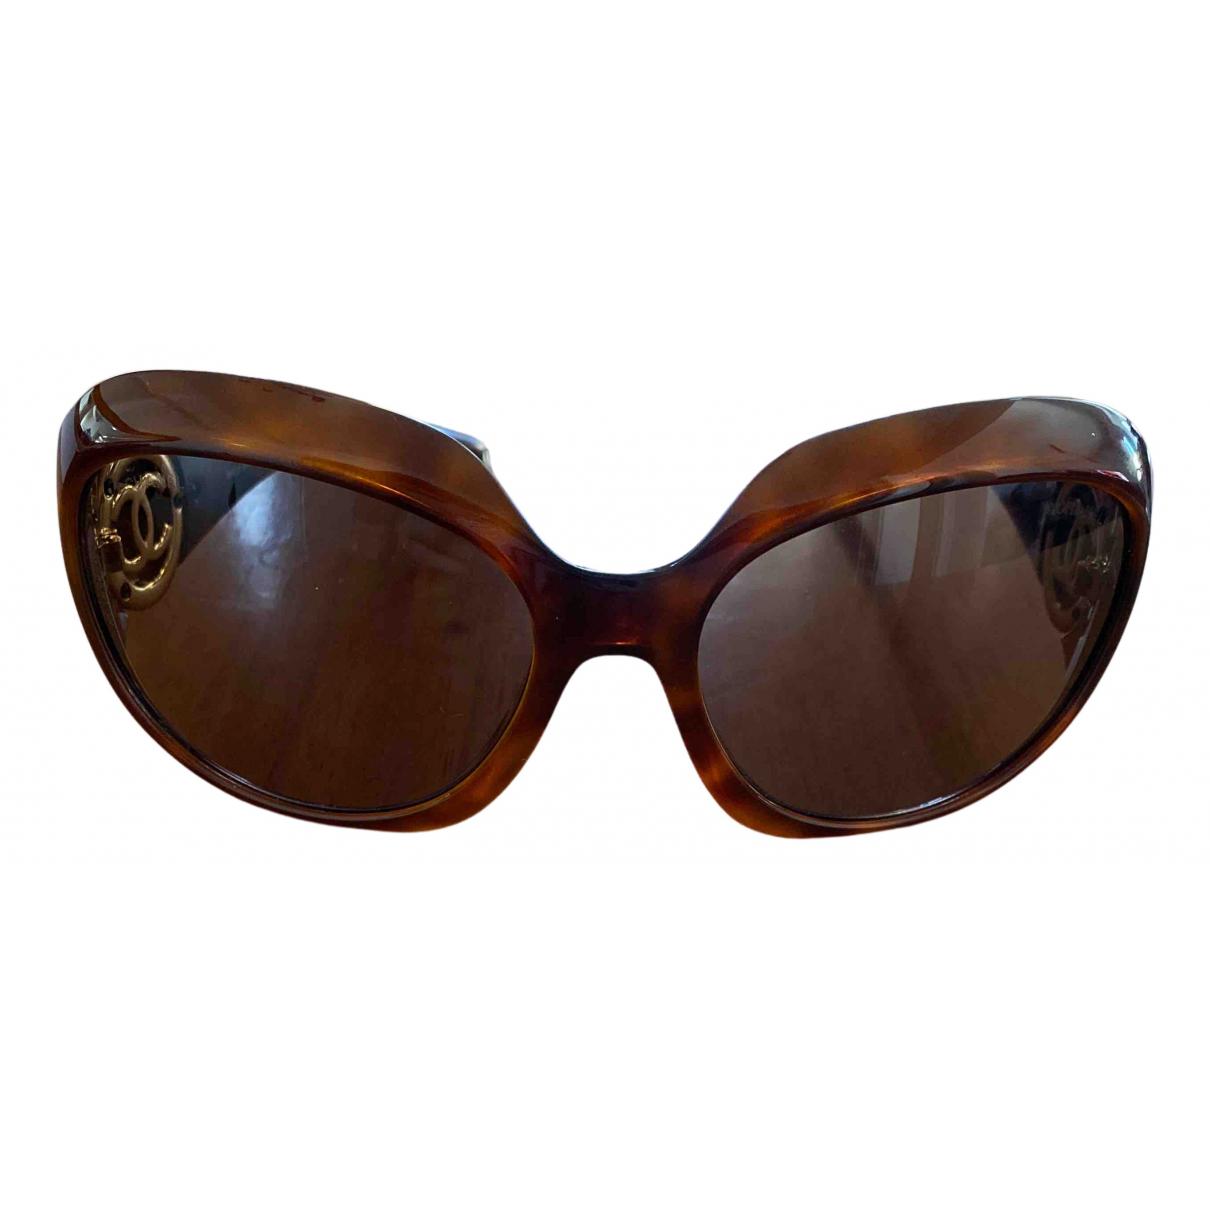 Chanel N Brown Sunglasses for Women N